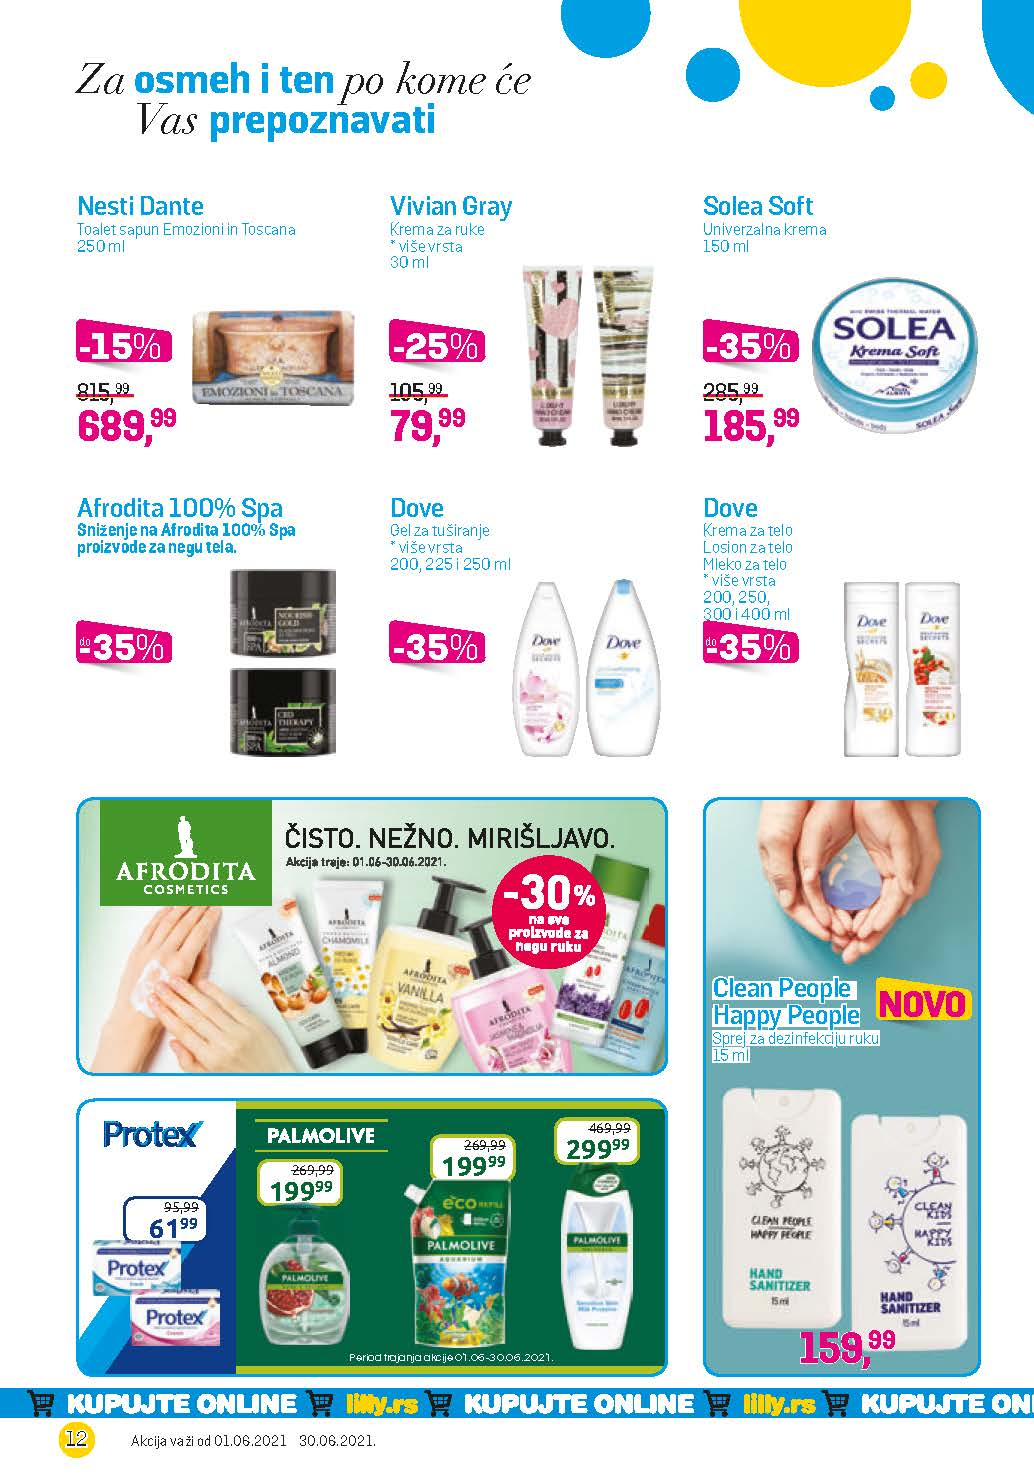 LILLY Katalog LILLY ONLINE Akcija JUN 2021 01.06.2021. 30.06.2021. eKatalozi.com PR Page 12